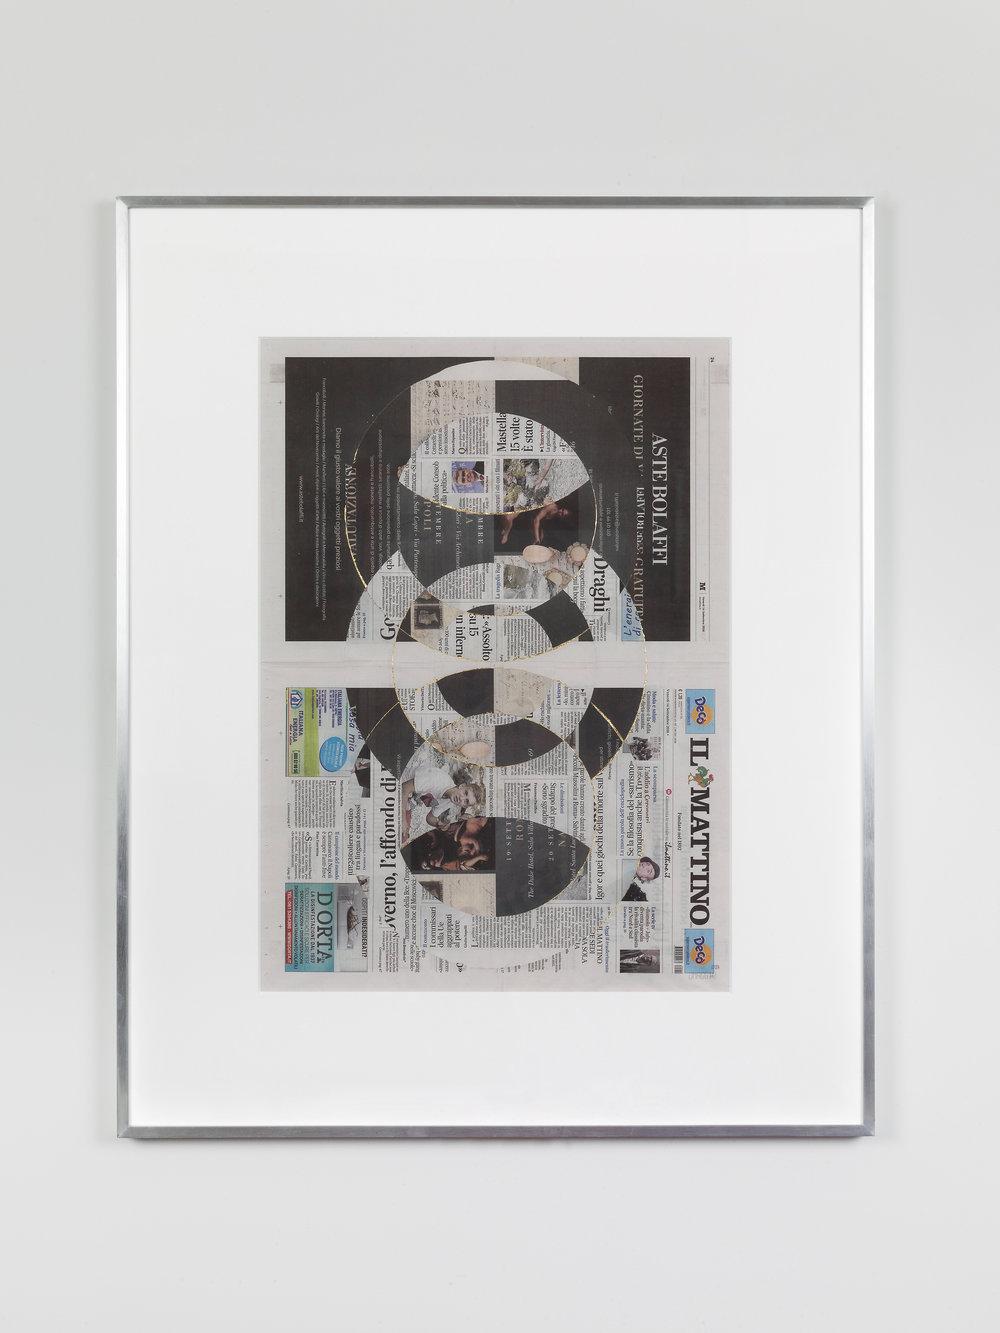 Il Mattino, Venerdi 14 Settembre 2018    2018   Newspaper, tape, and 22 karat gold leaf  39 3/8 x 31 1/2 inches   Blind Collages, 2017–